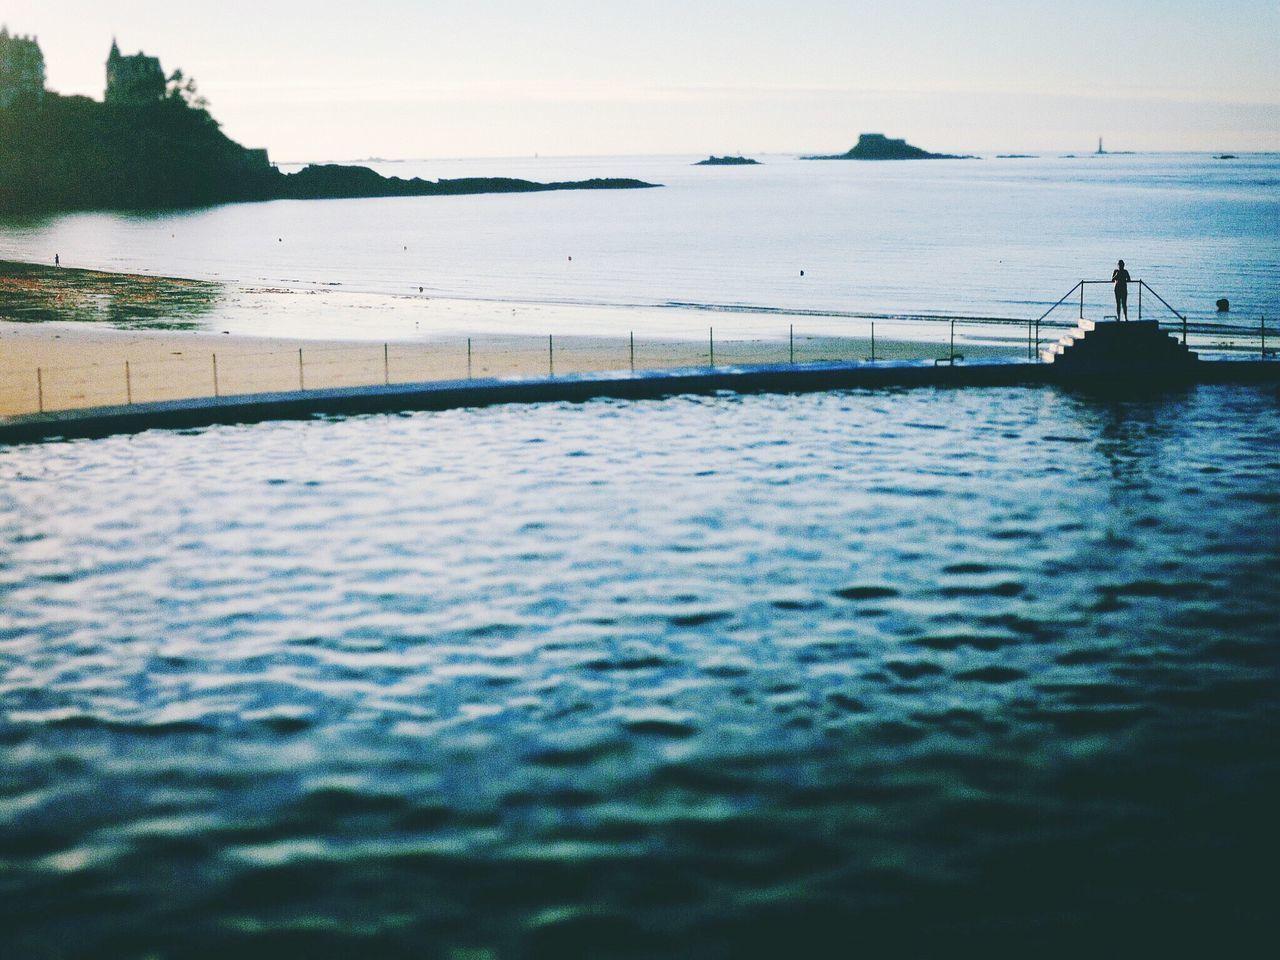 Pool Swimming Pool Beach Beachphotography Landscape Check This Out Hello World Bretagne Bretagnetourisme Summer